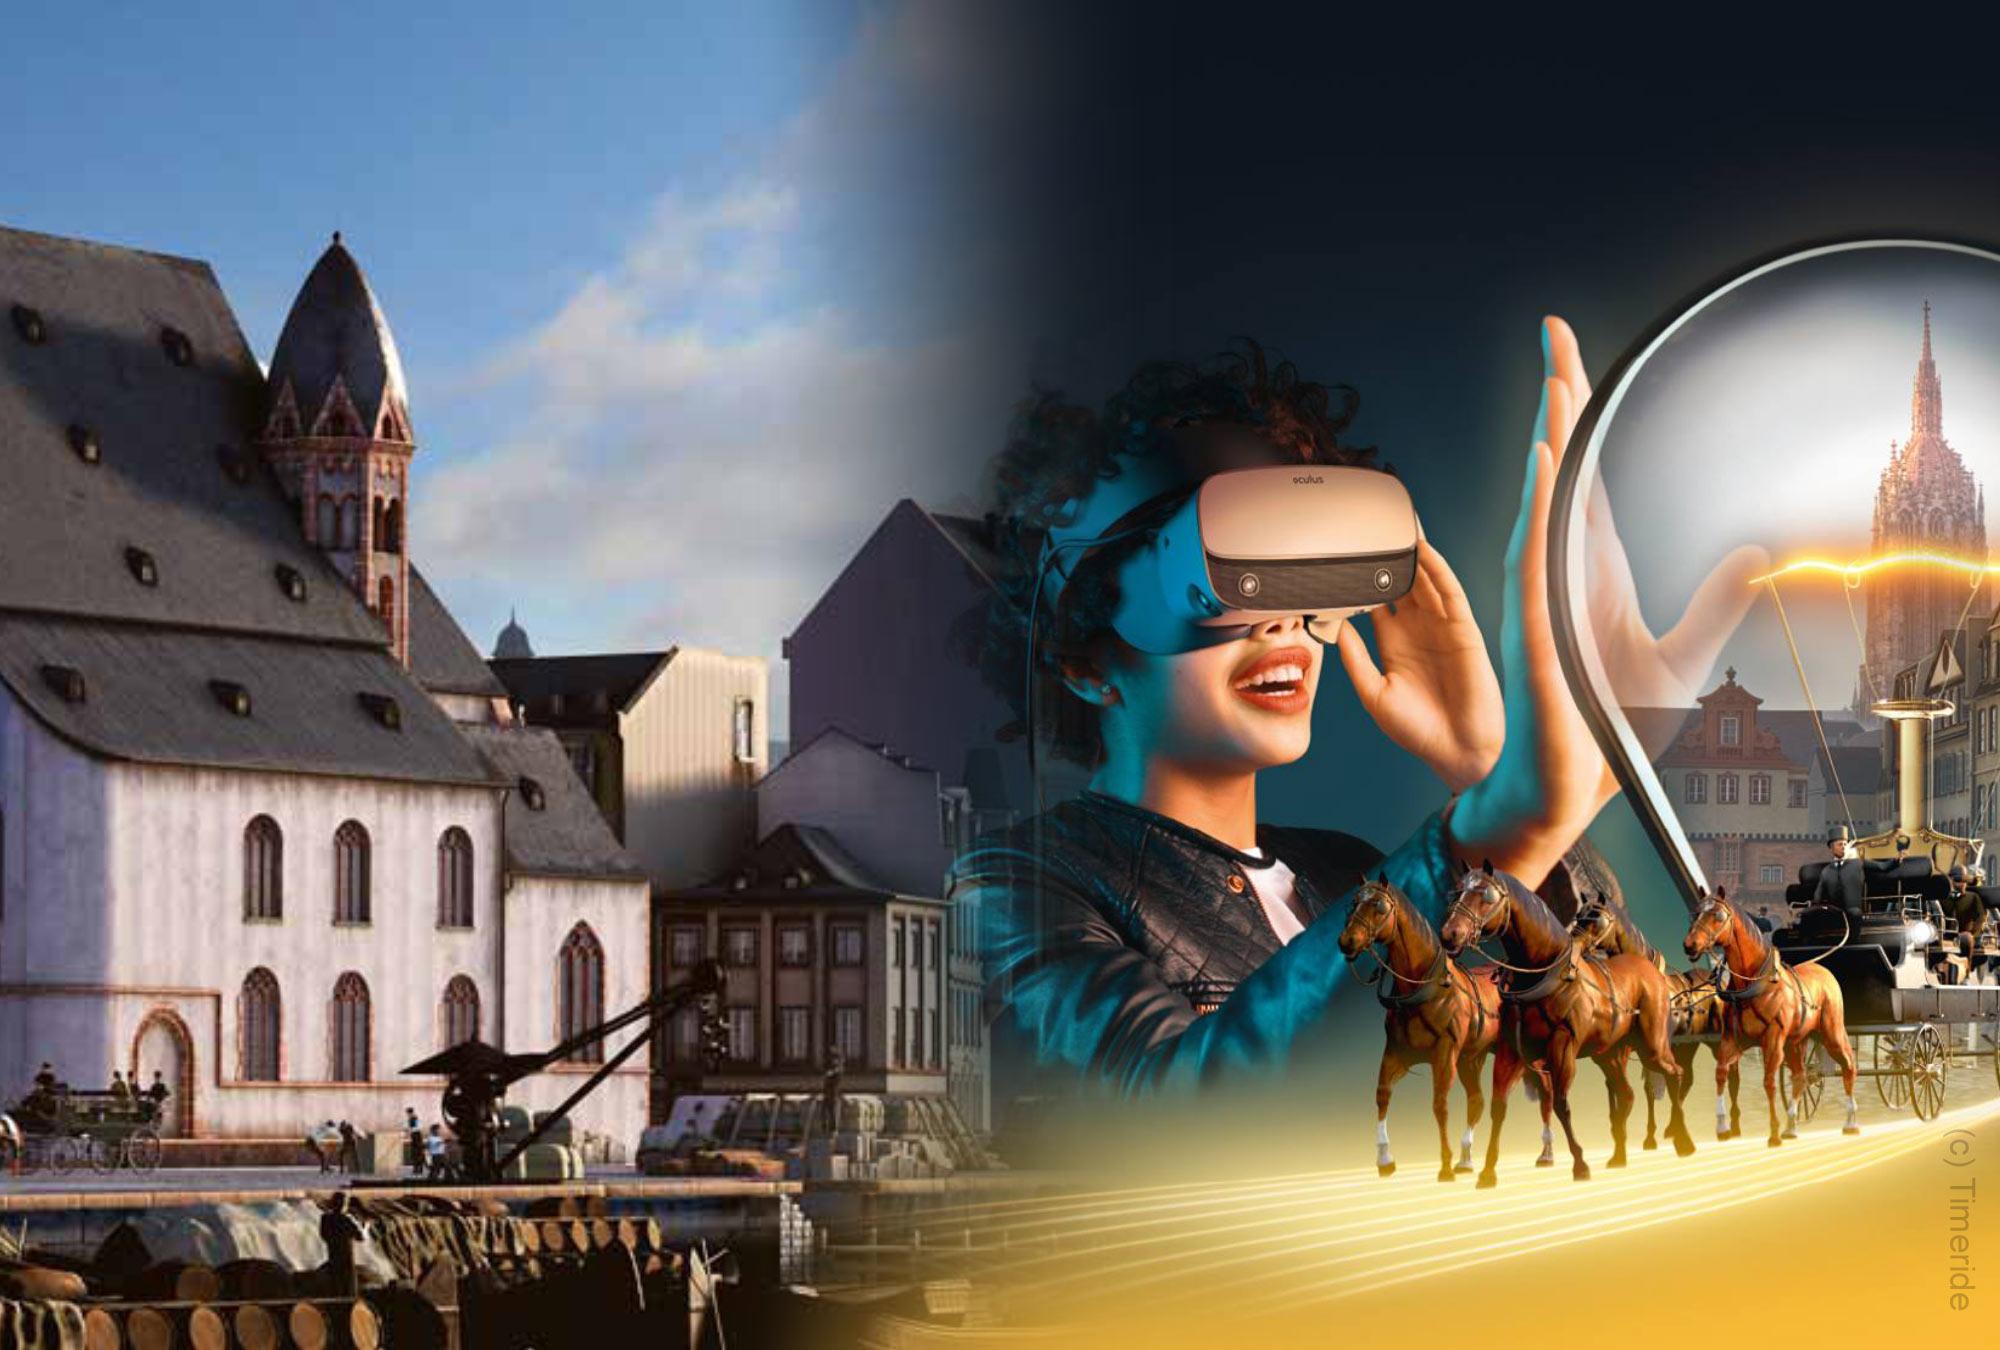 Timeride Frankfurt - Sehenswürdigkeit Frankfurt - VR Virtual Reality Tour - Stadtrundfahrt